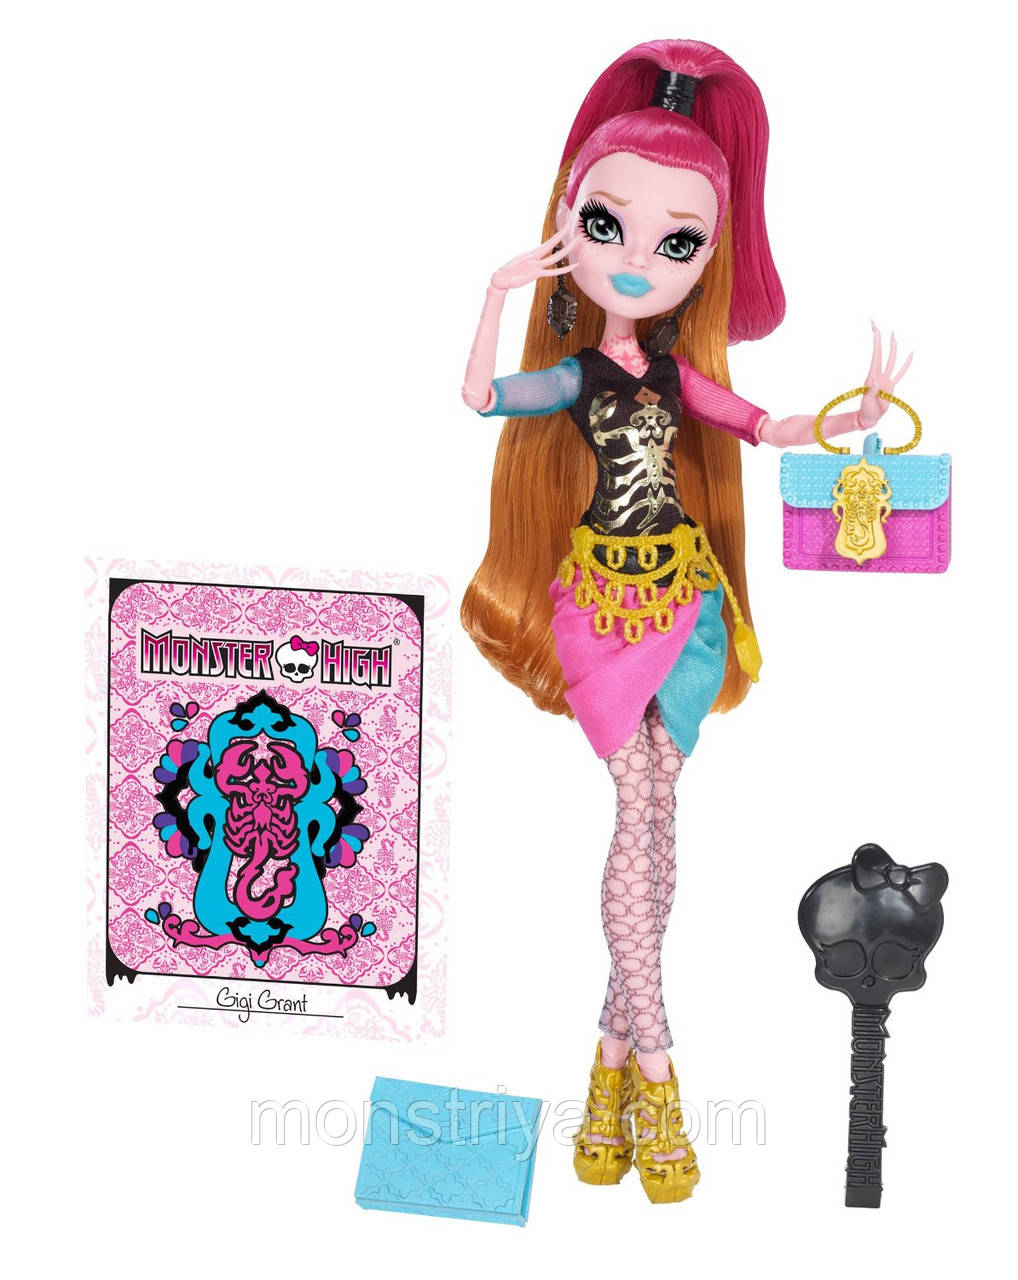 Лялька Монстер Хай Джіджі Грант Новий Скарместер Monster High New Scaremester Gigi Grant Doll